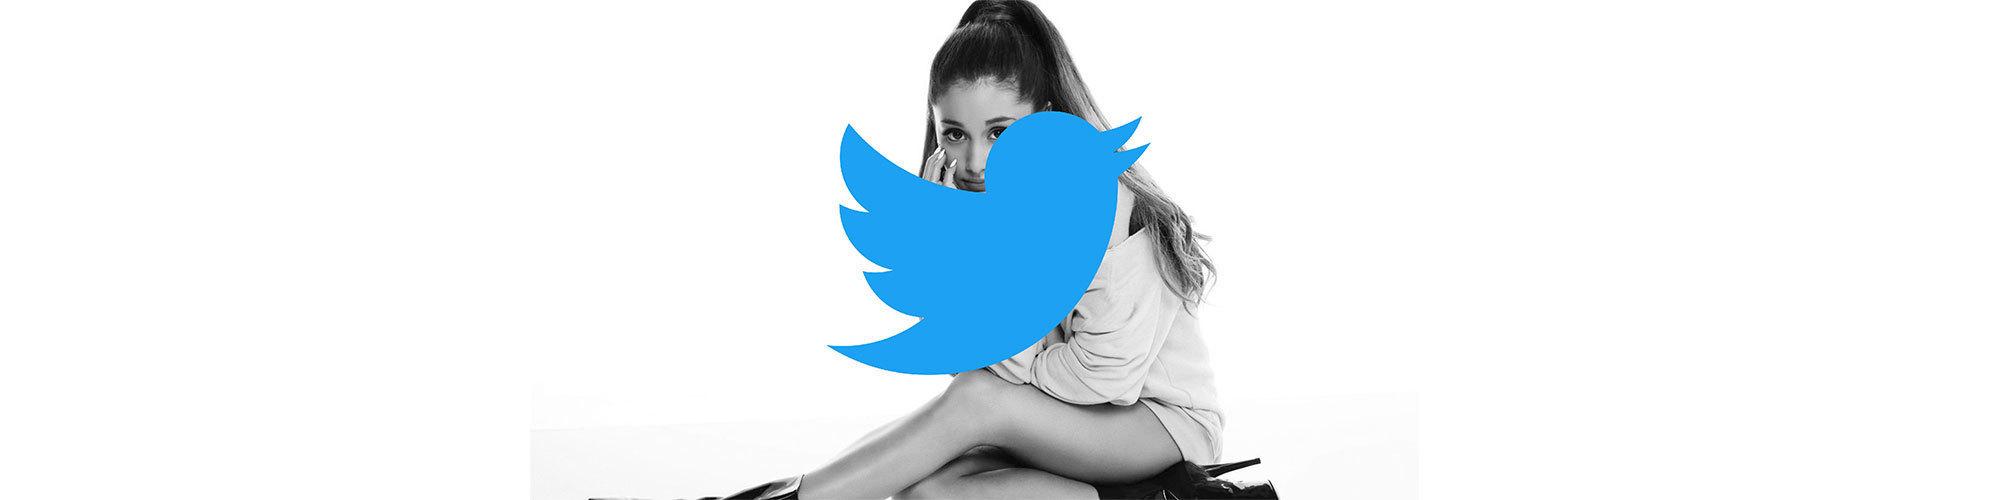 Ariana twitter header 0